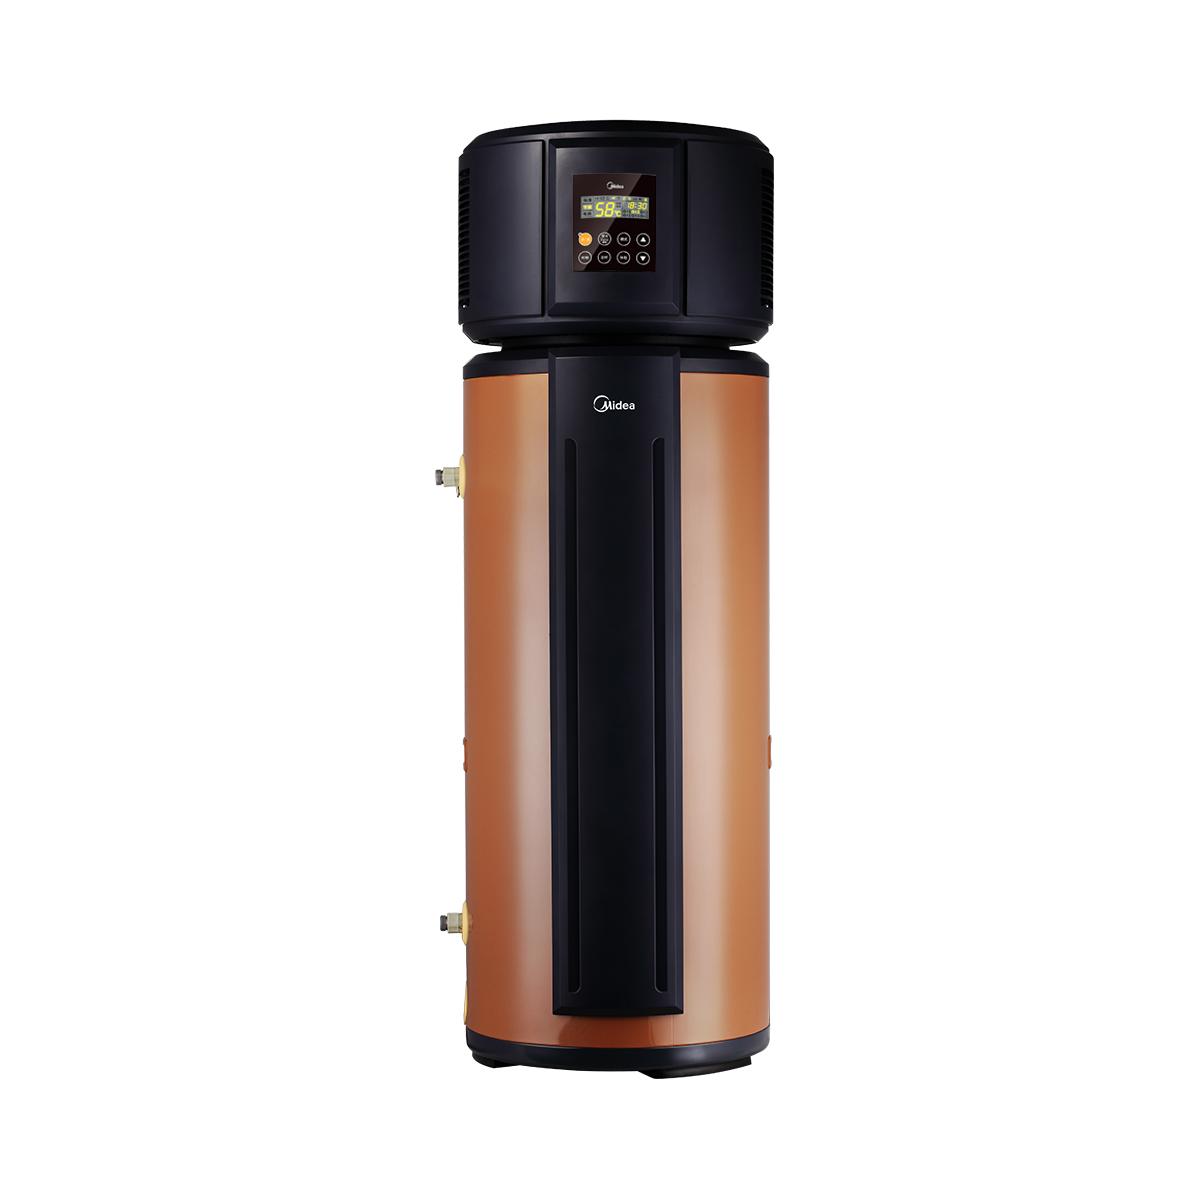 Midea/美的 RSJ-15/150RDN3-C空气能热水器整体式 说明书.pdf